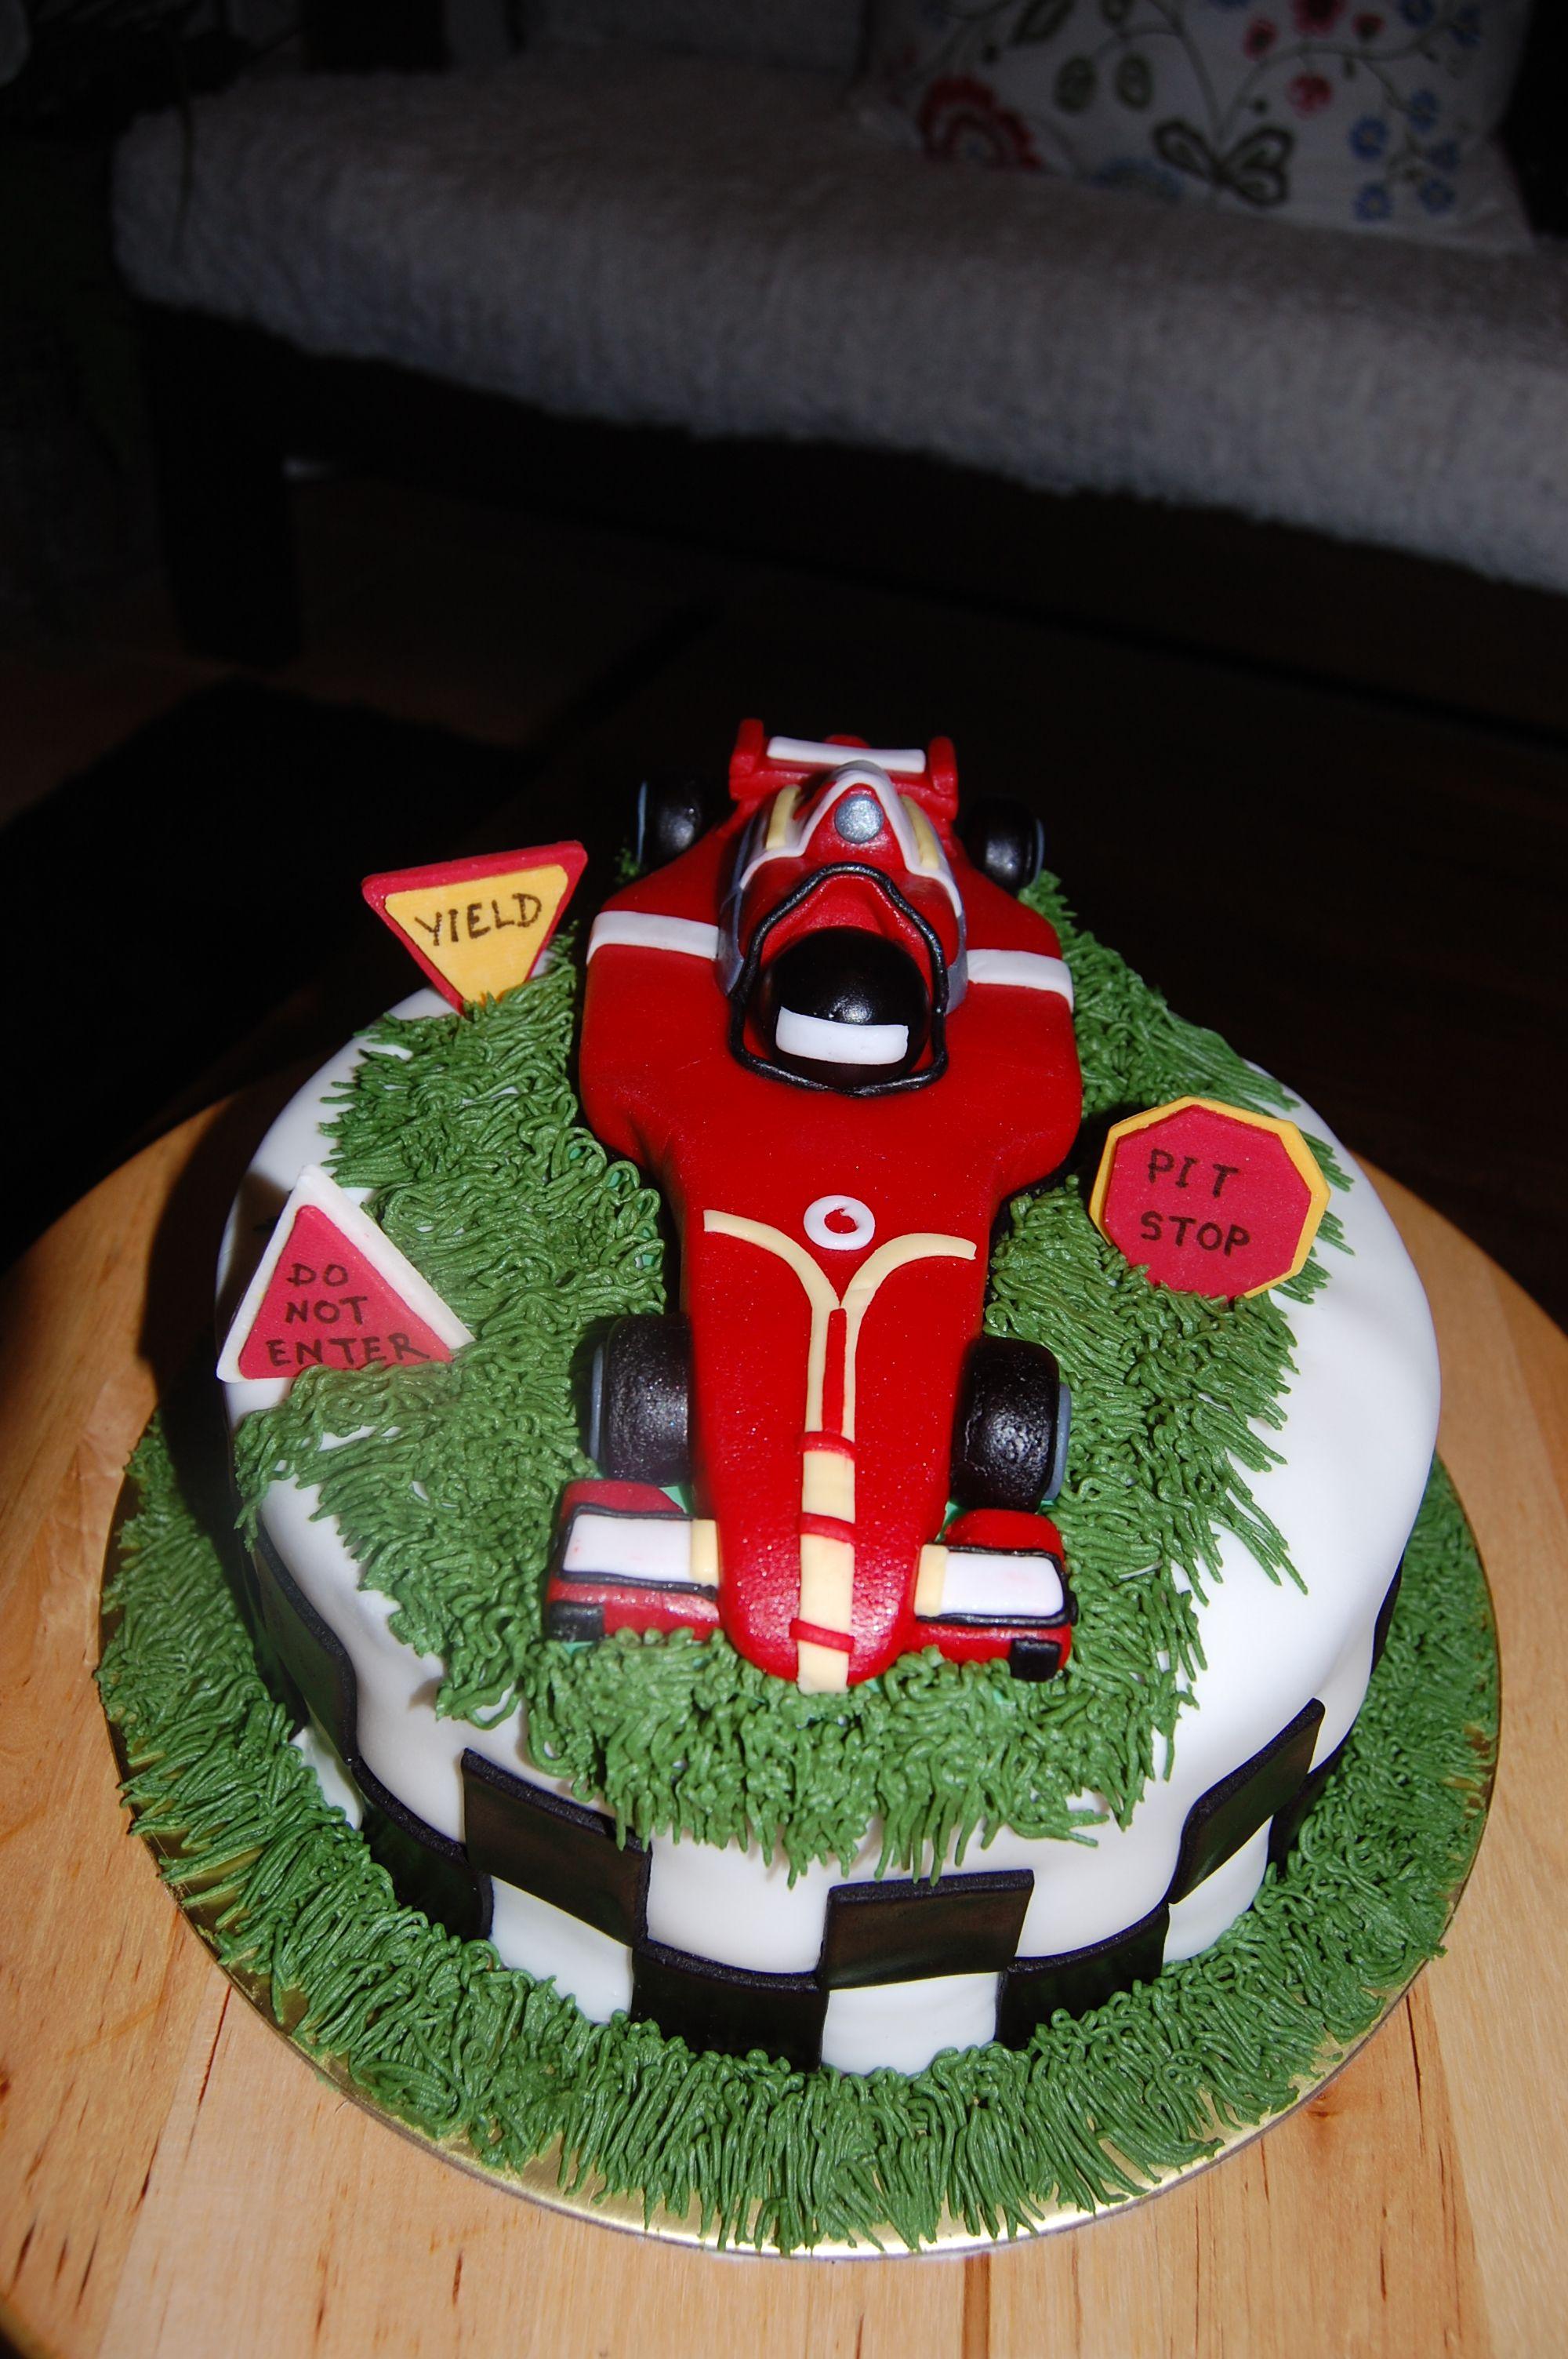 F1 Car cake with edible car topper cakes Shenulis Pinterest